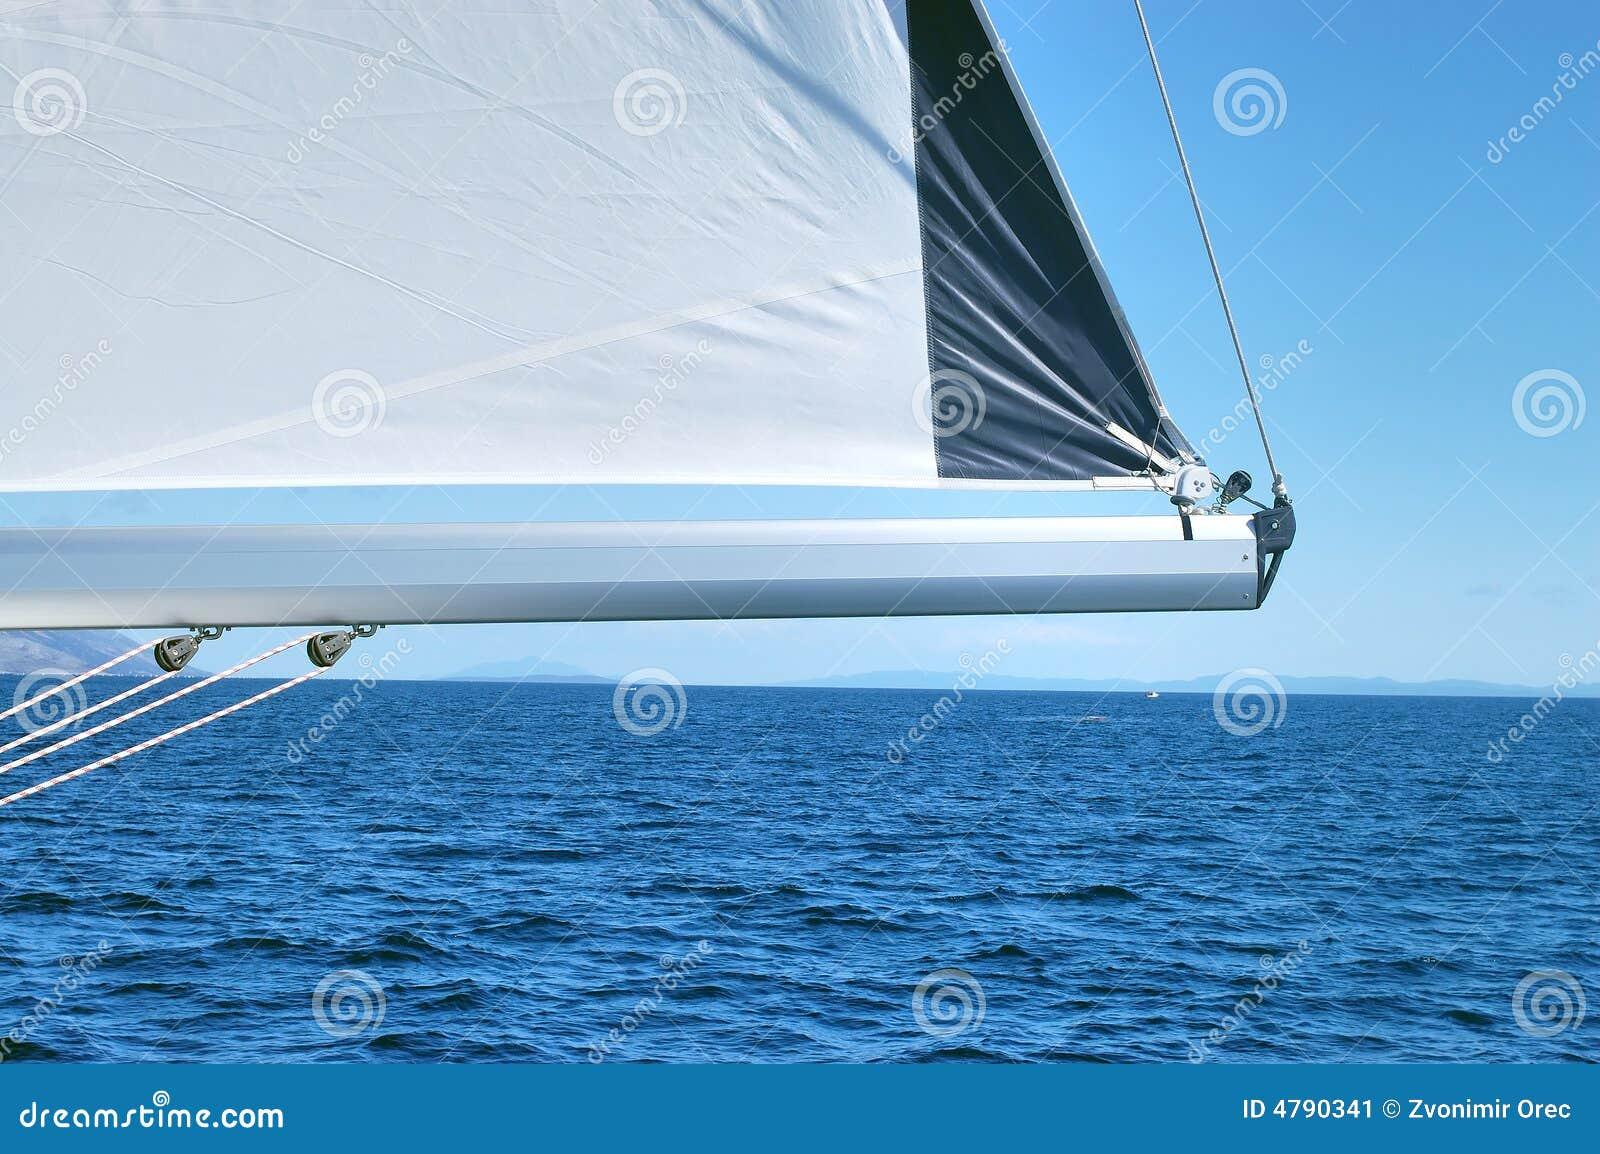 Sailing lightly